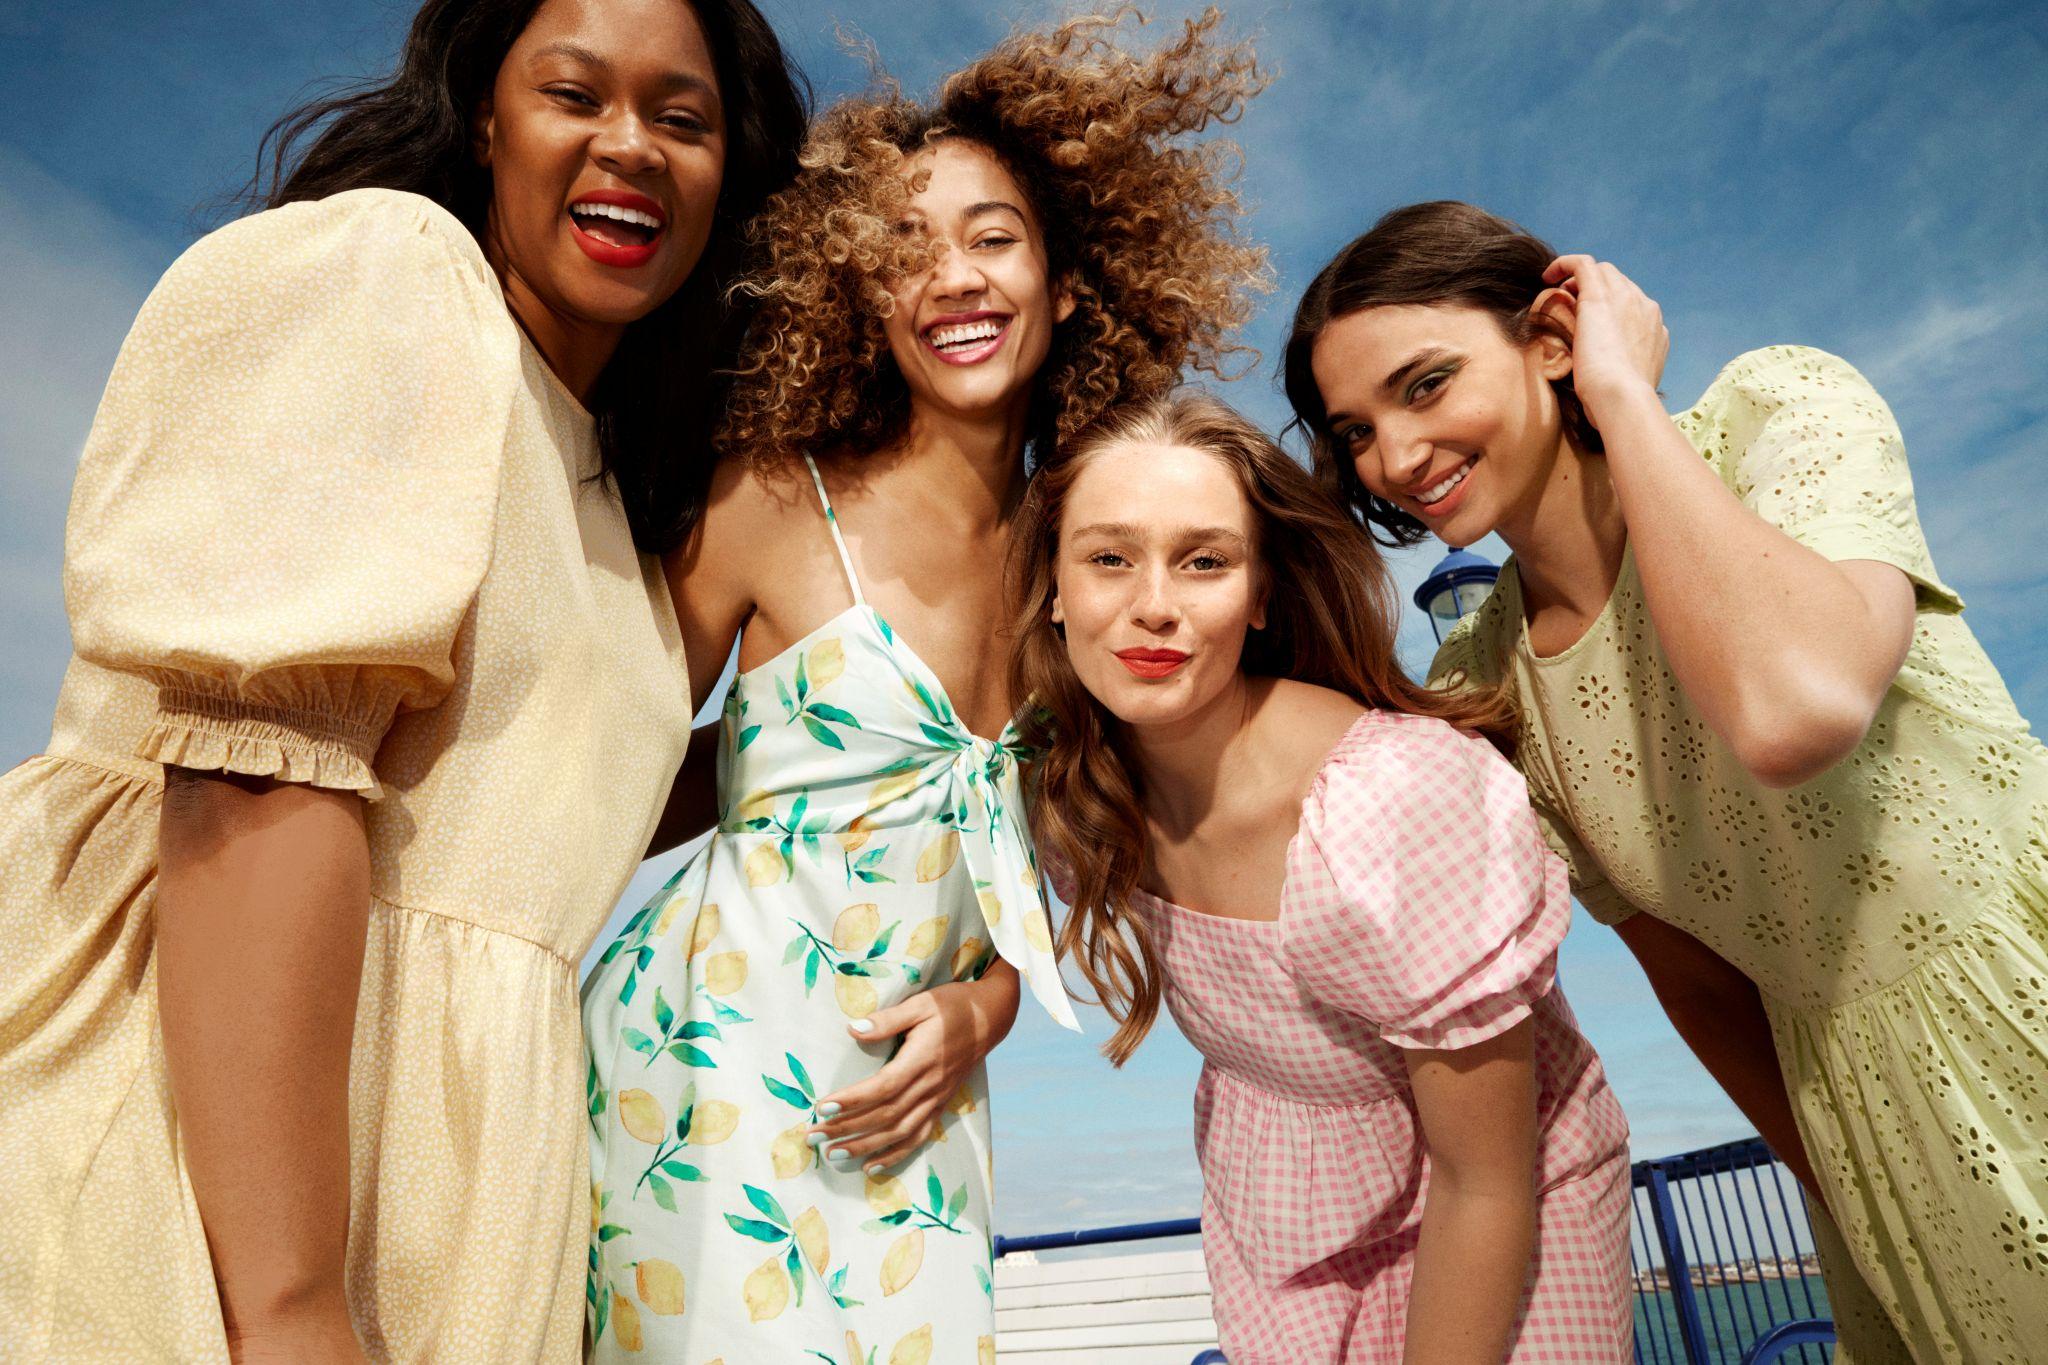 4 women wearing dresses from New Look